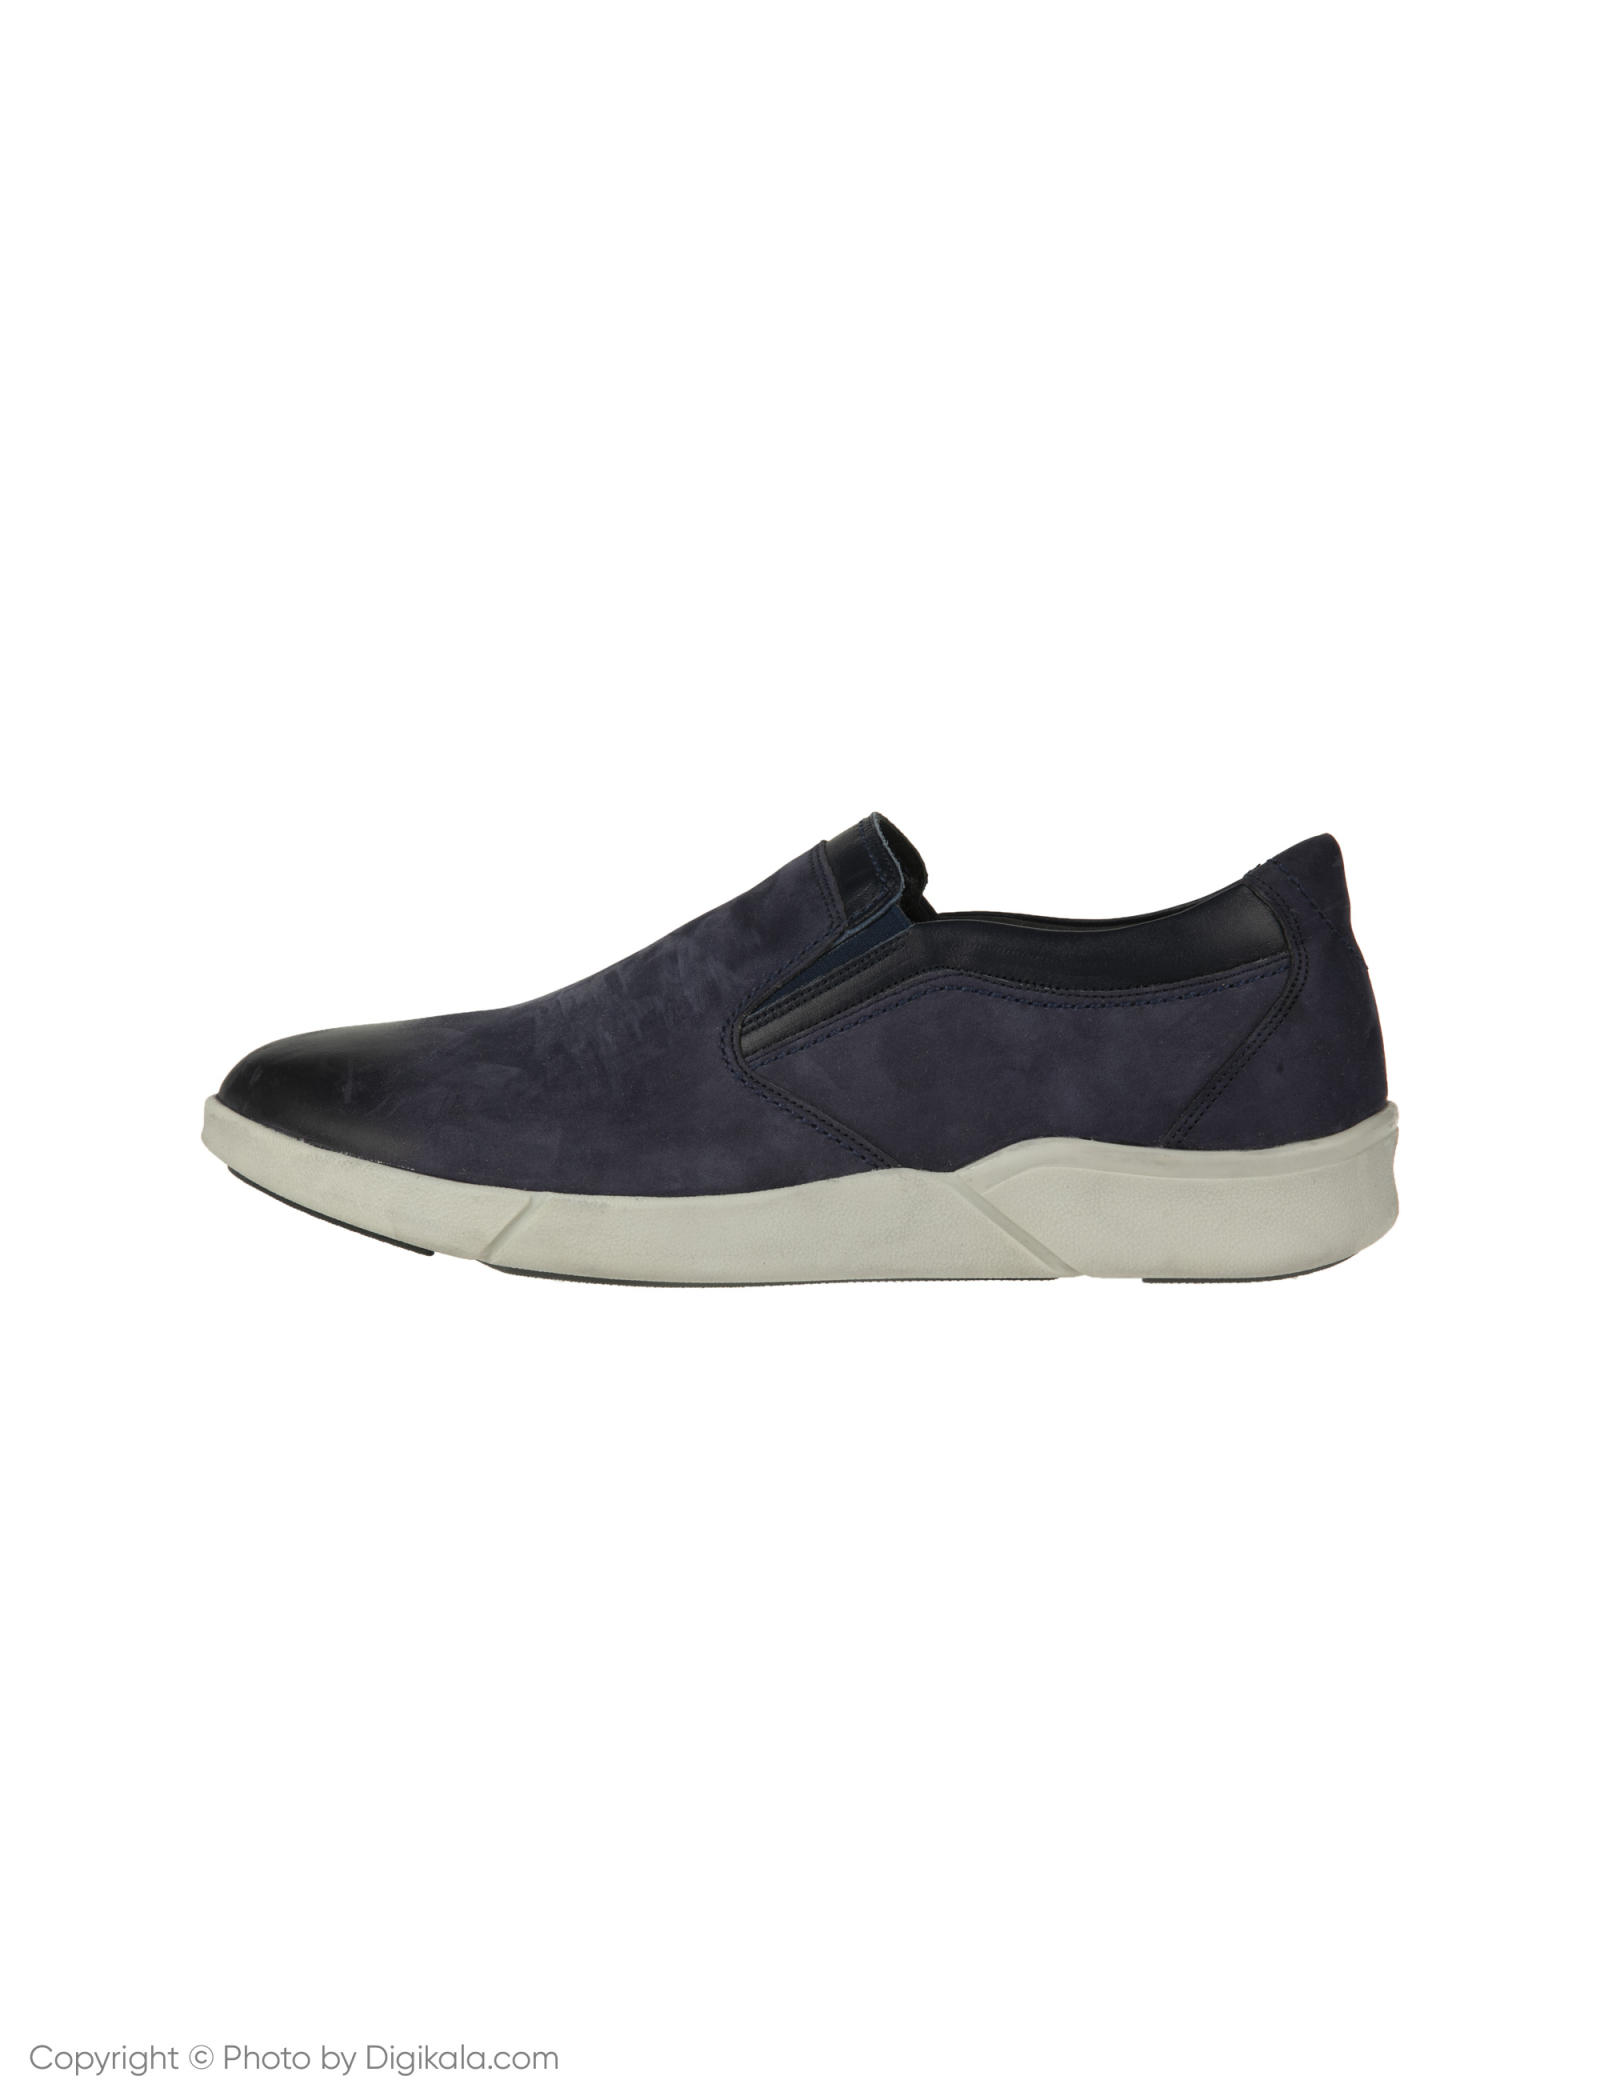 کفش روزمره مردانه ساتین مدل SN7178A-103 -  - 1